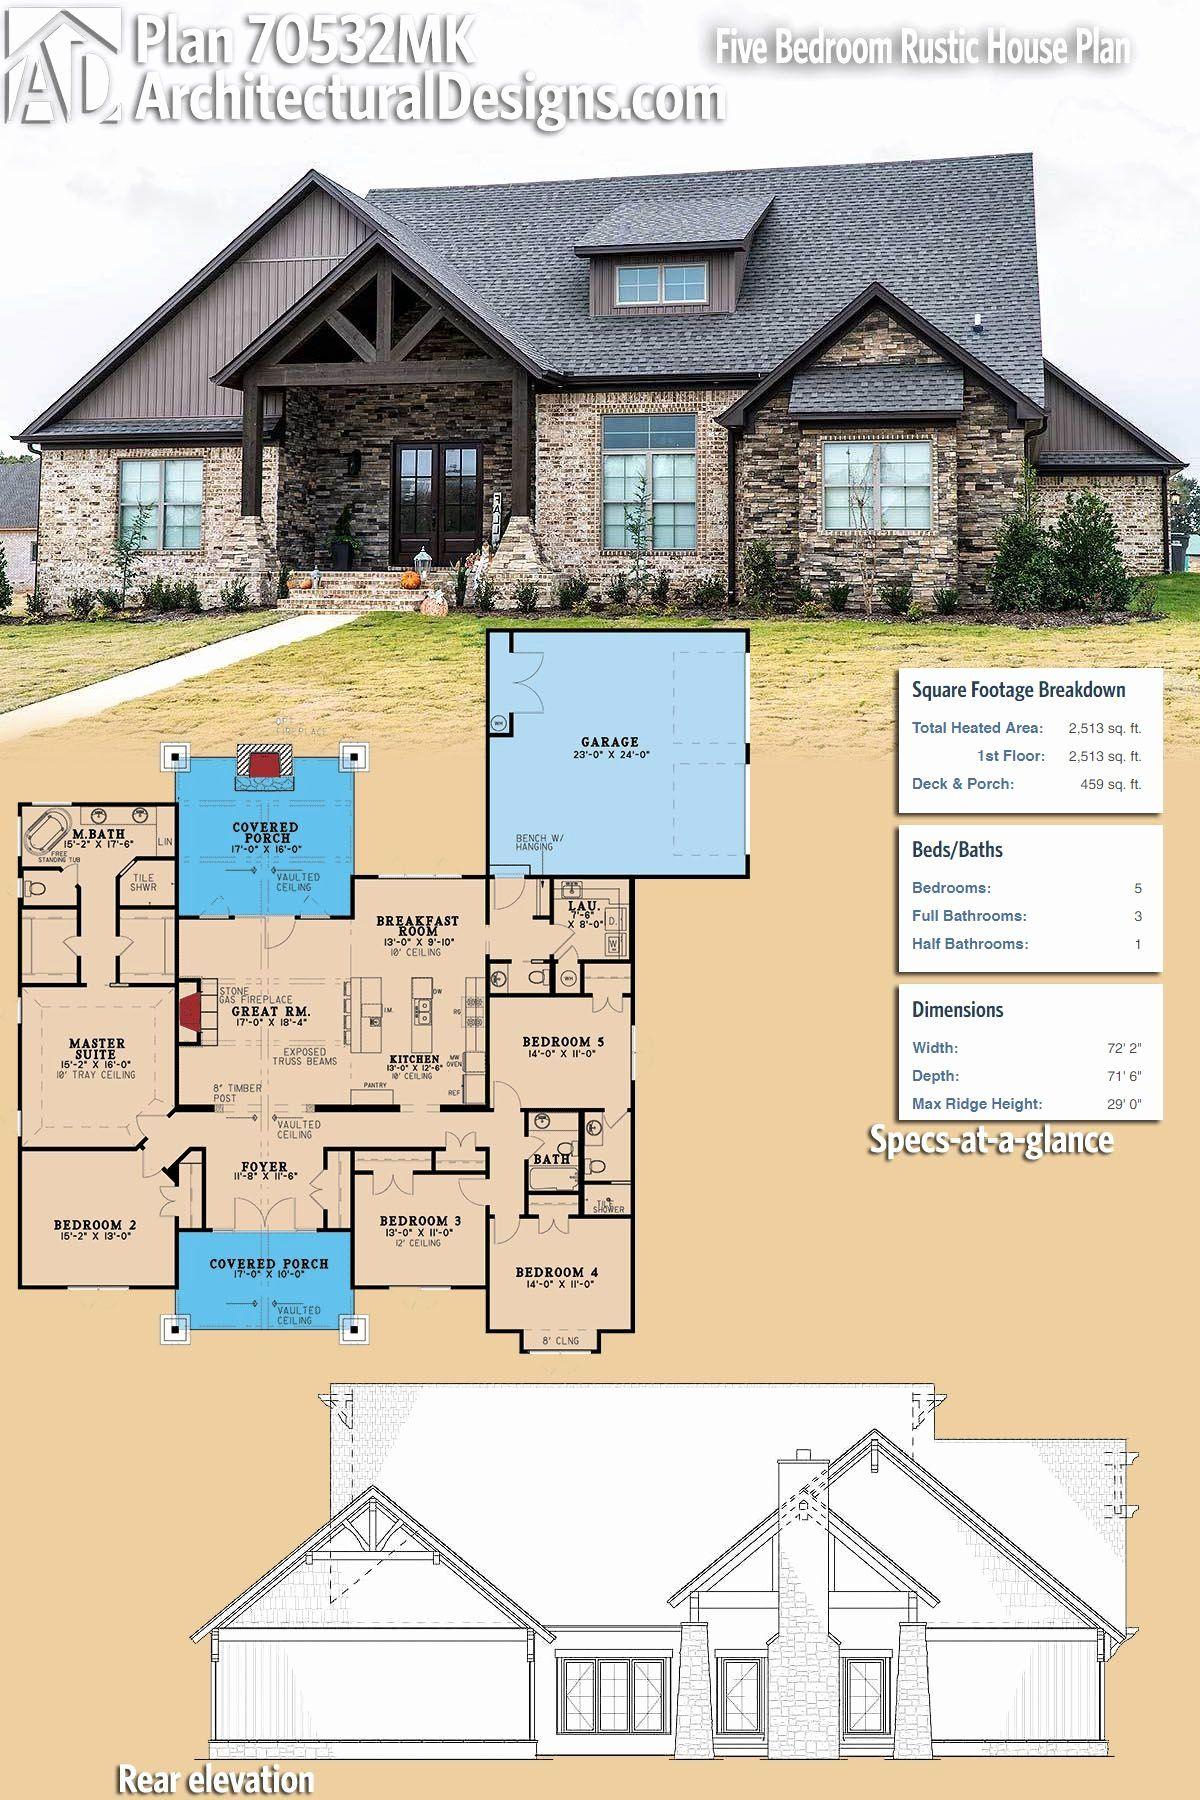 2500 sq foot house plans fresh plan mk five bedroom rustic